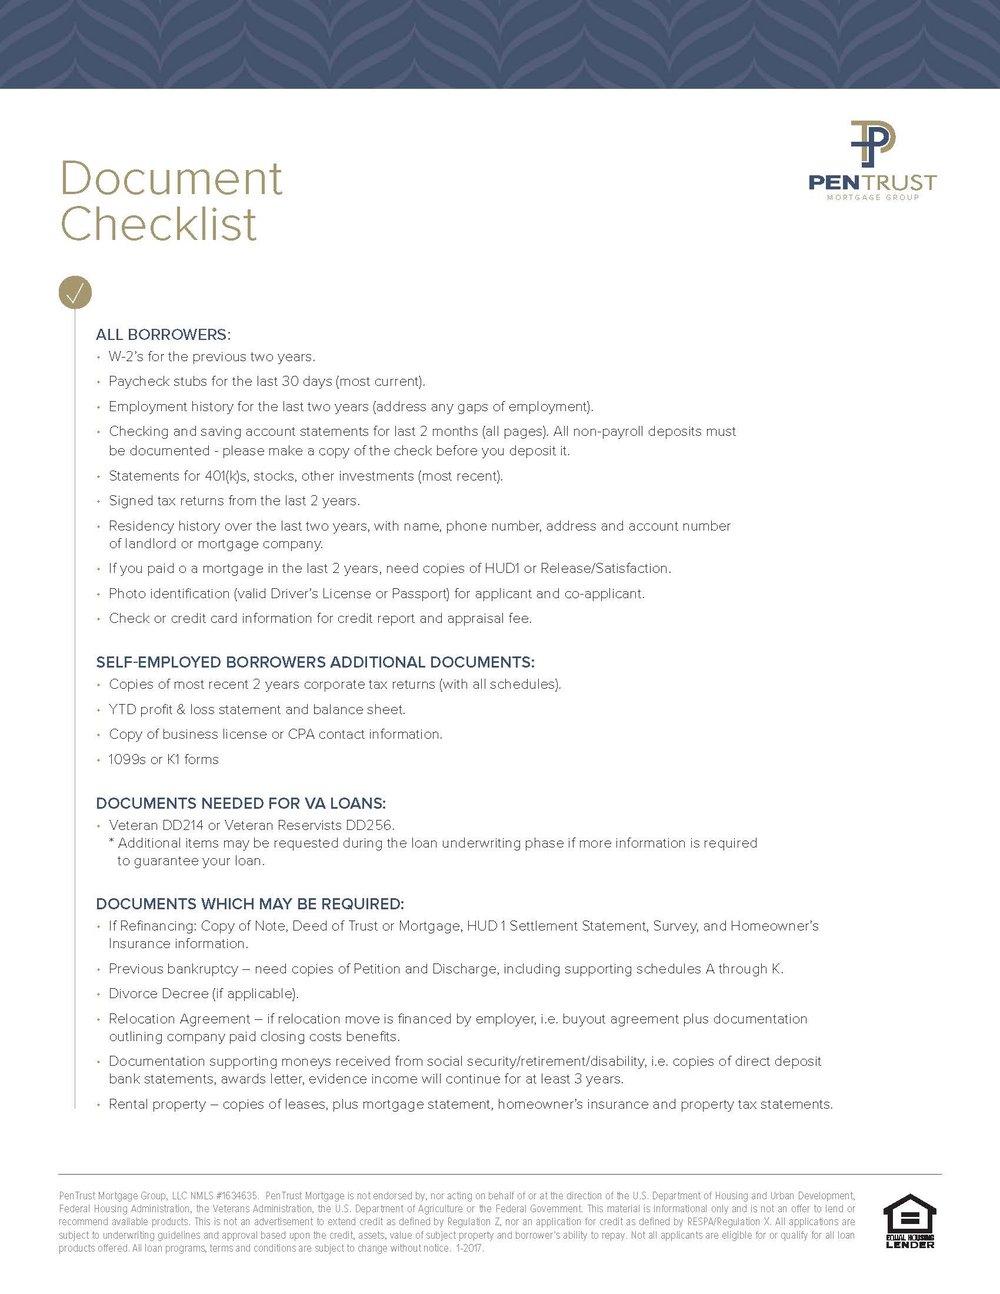 2017-12 Pentrust Buyer Guide_v3d1_Page_2.jpg